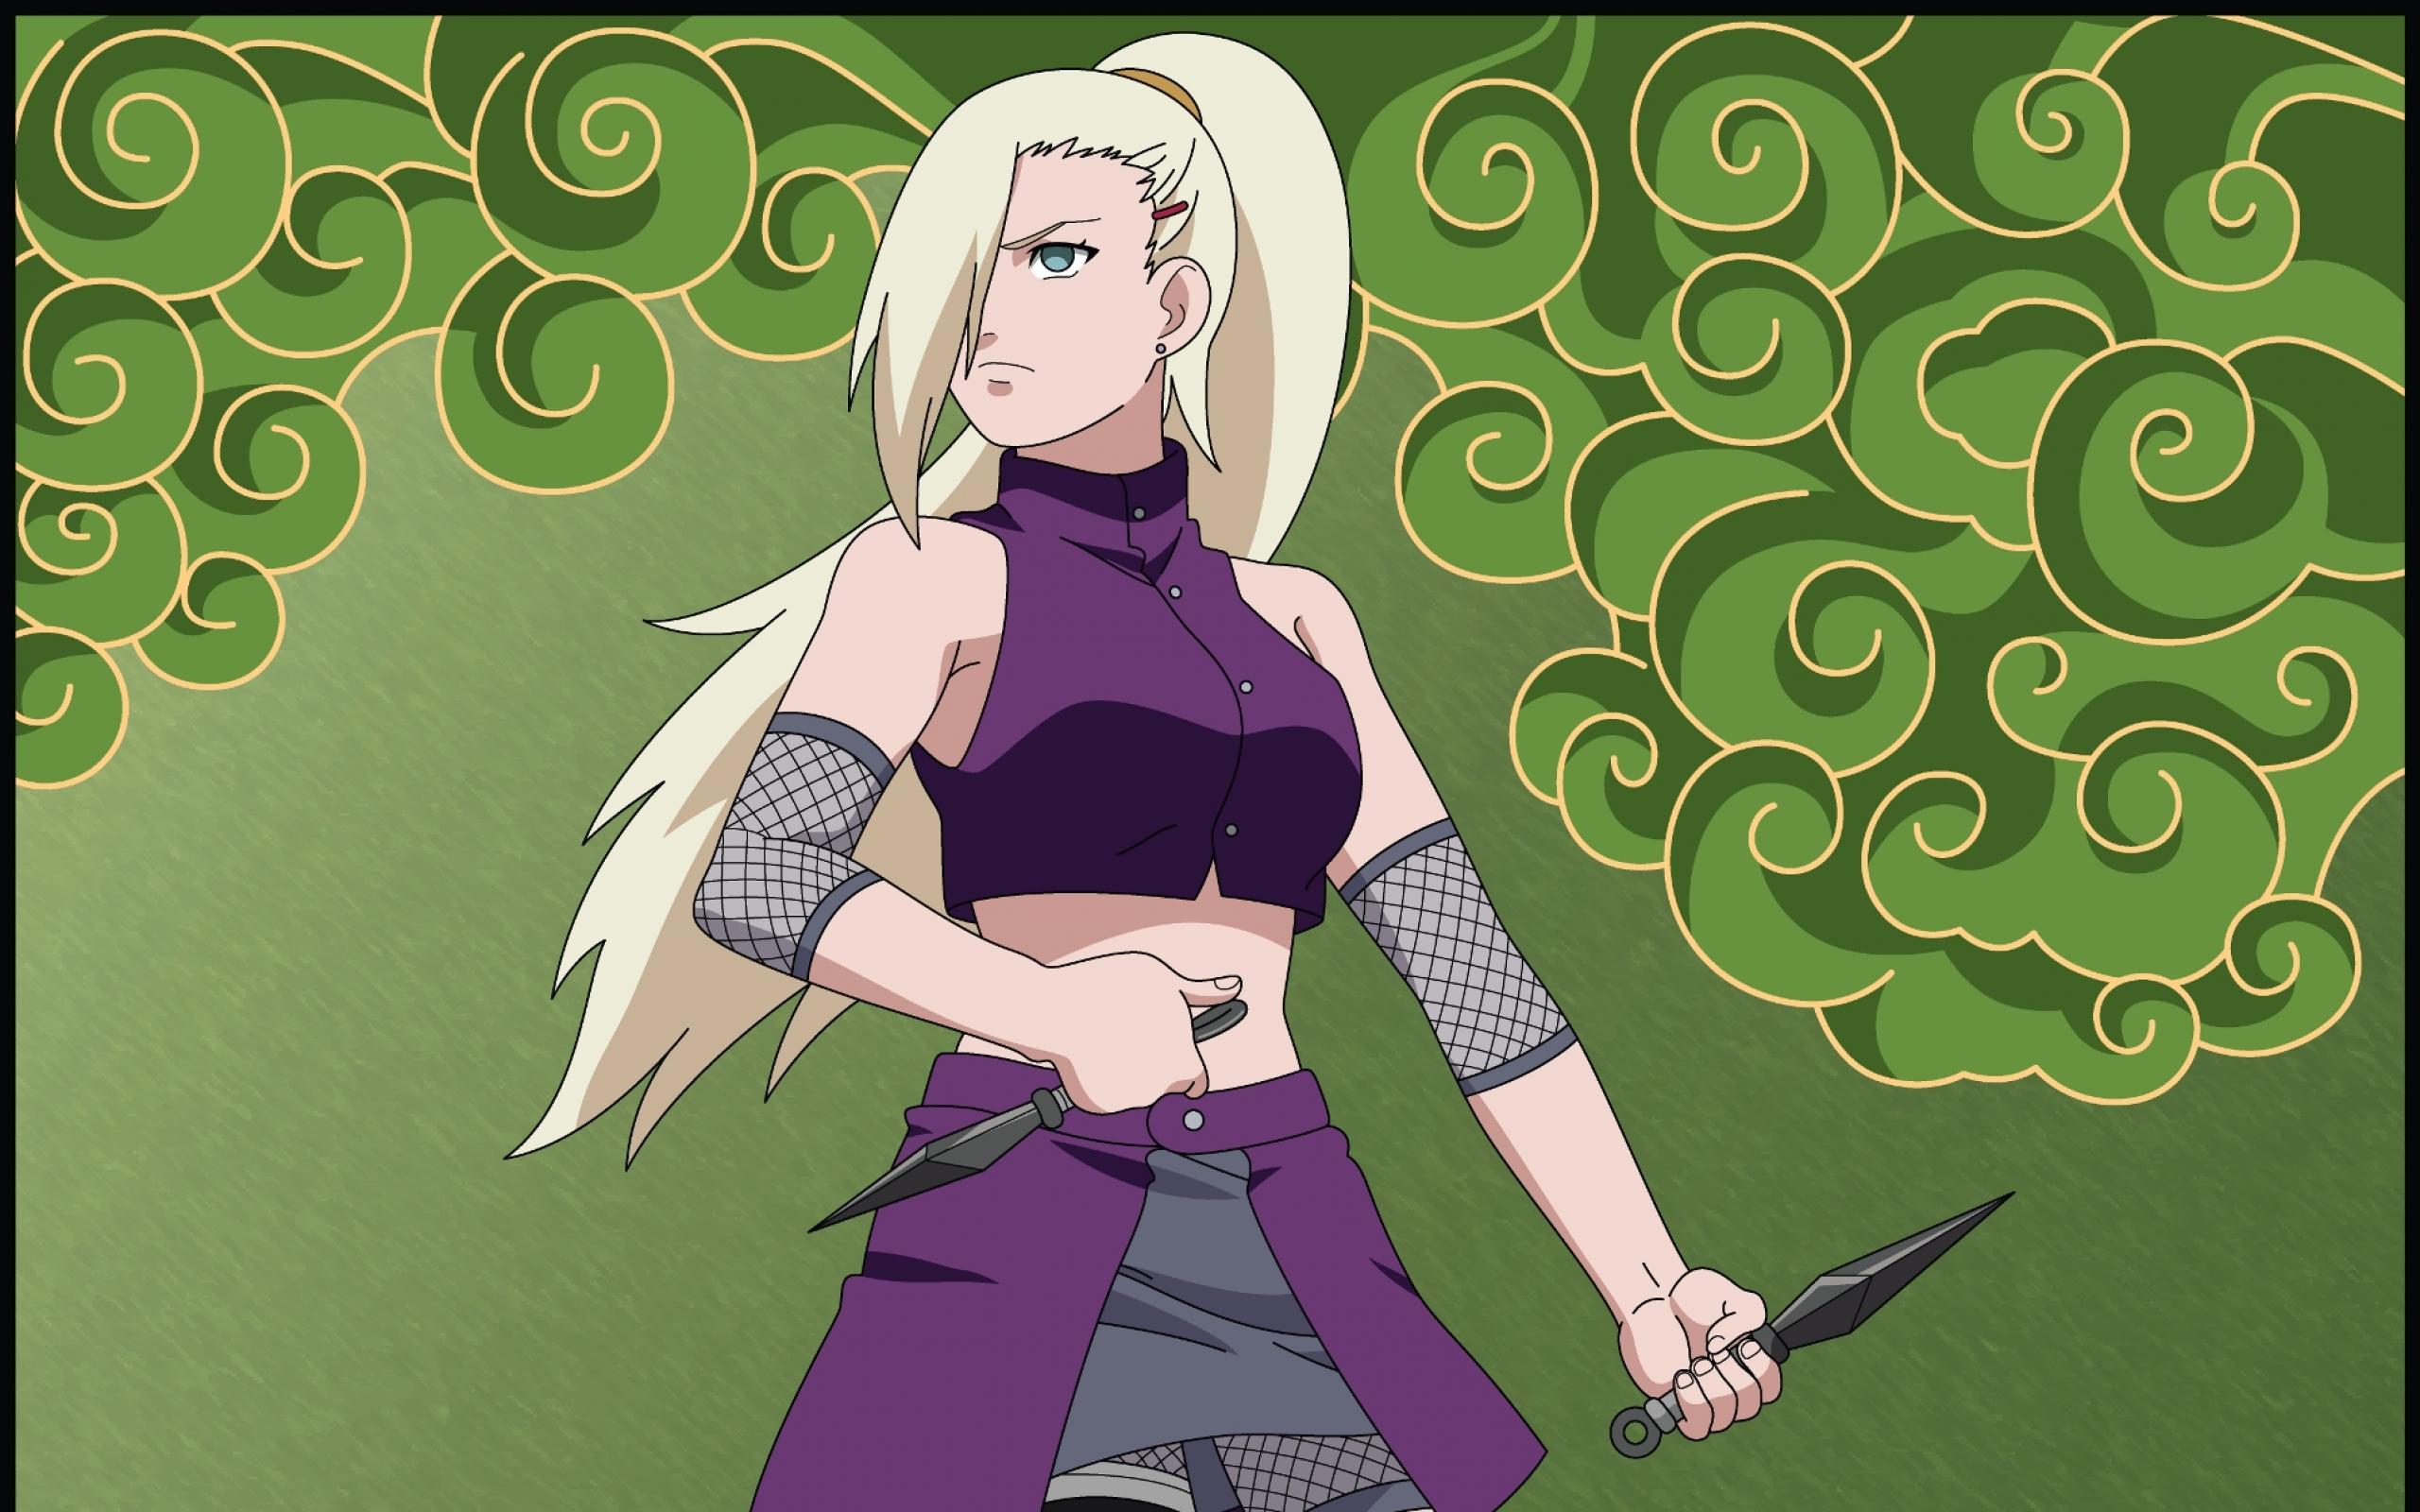 Naruto shippuden pussy girl 6